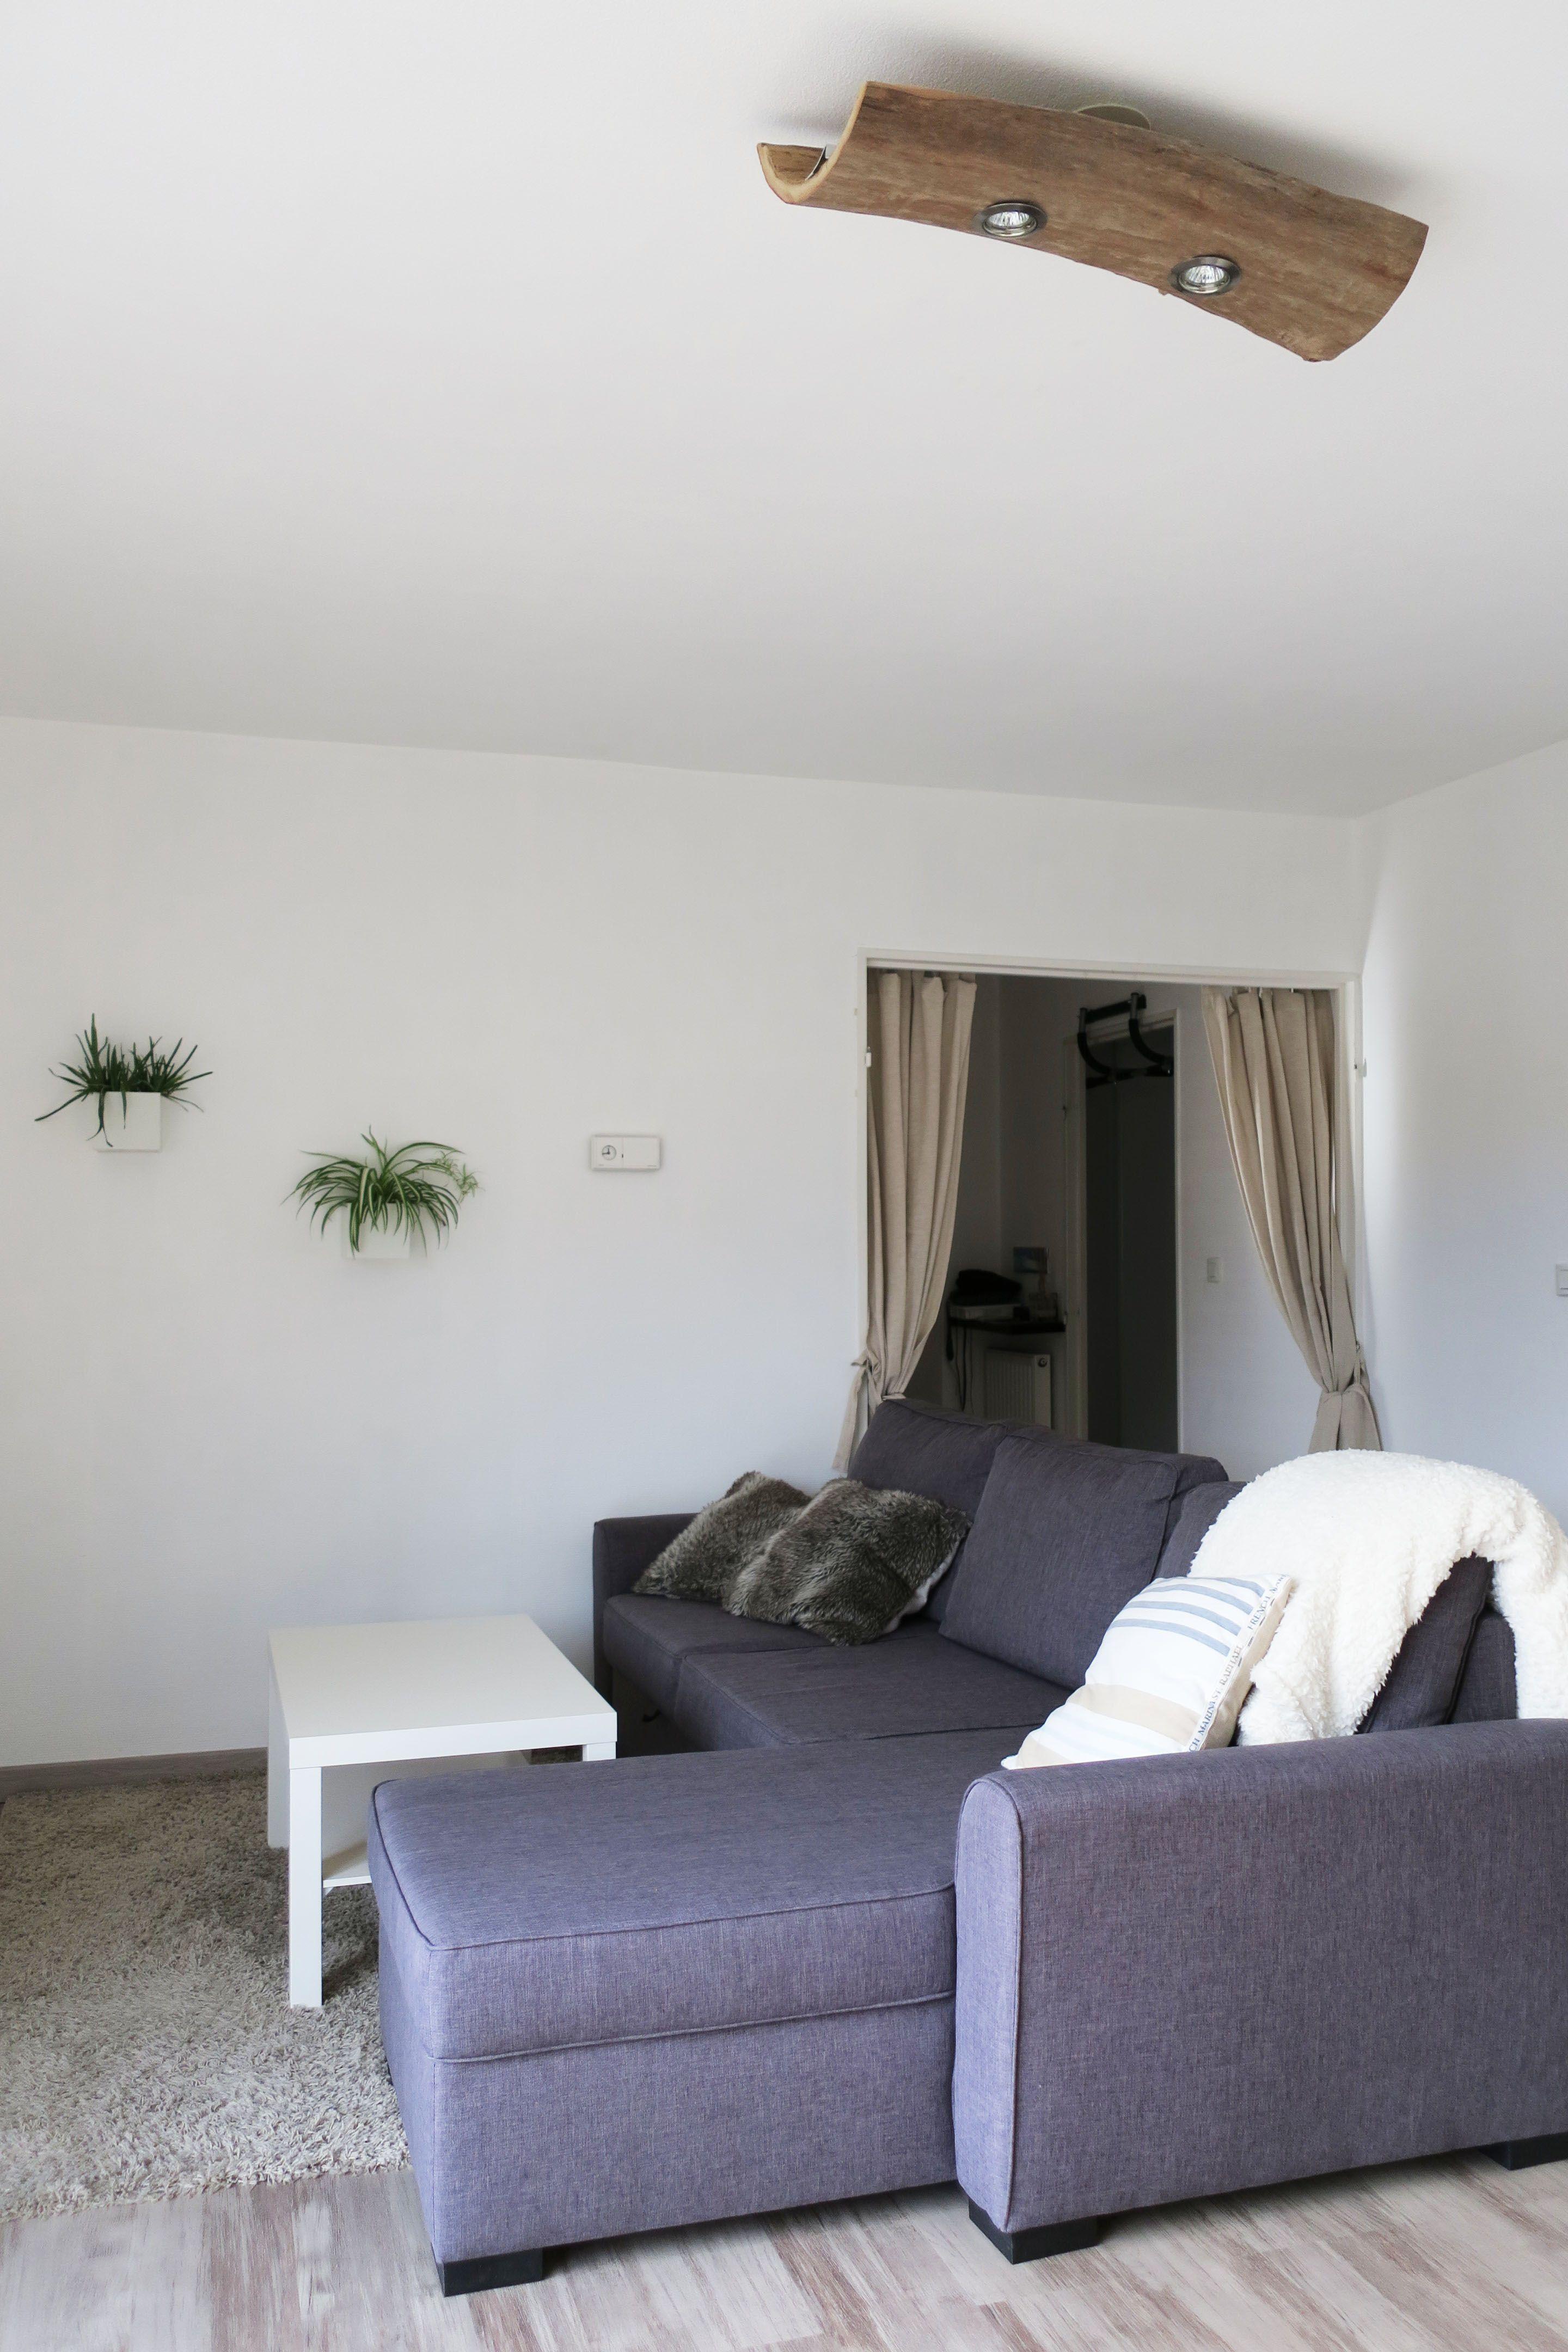 plafonnier d co bois flott pinterest. Black Bedroom Furniture Sets. Home Design Ideas